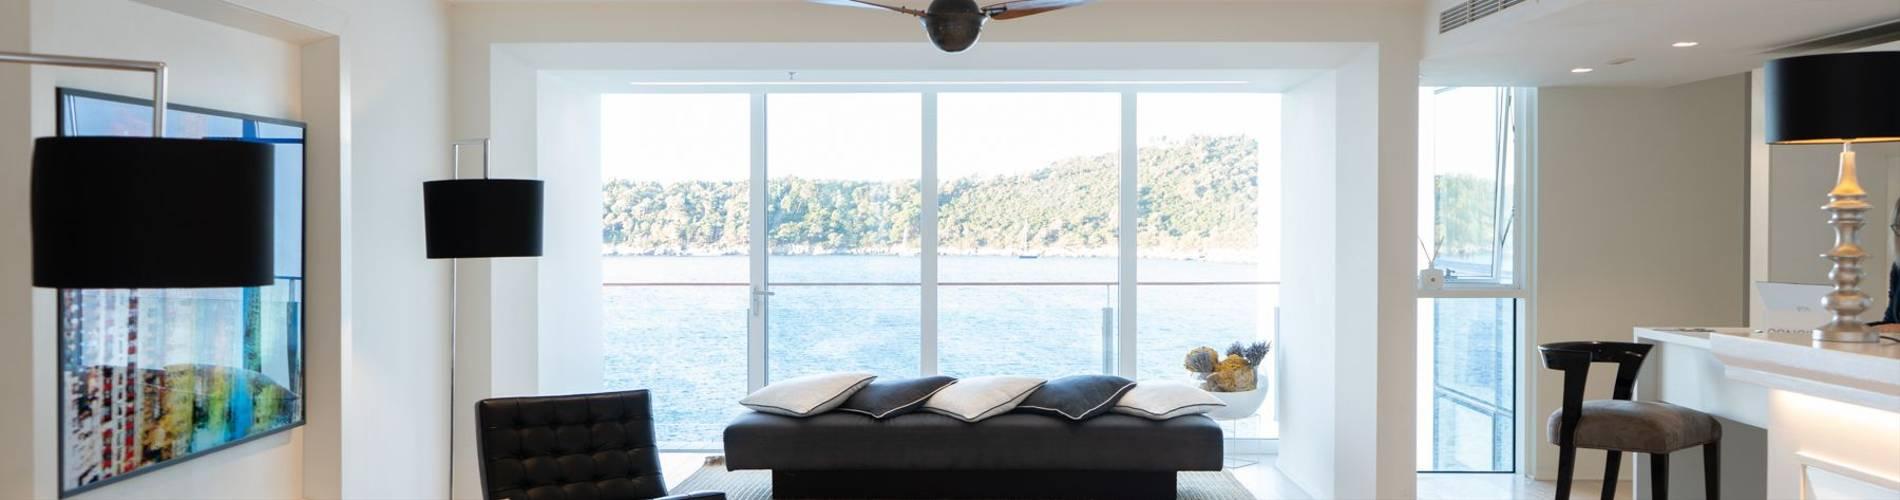 Bayfront view from reception at Hotel Villa Dubrovnik.jpg